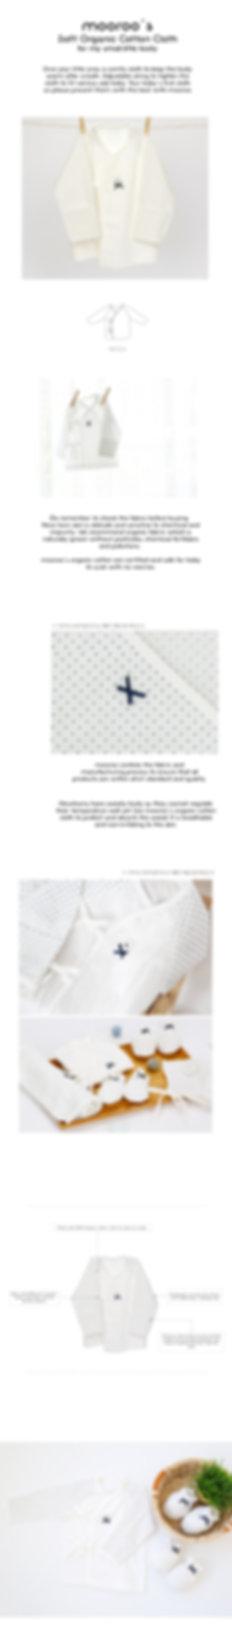 Organic Cloth.jpg